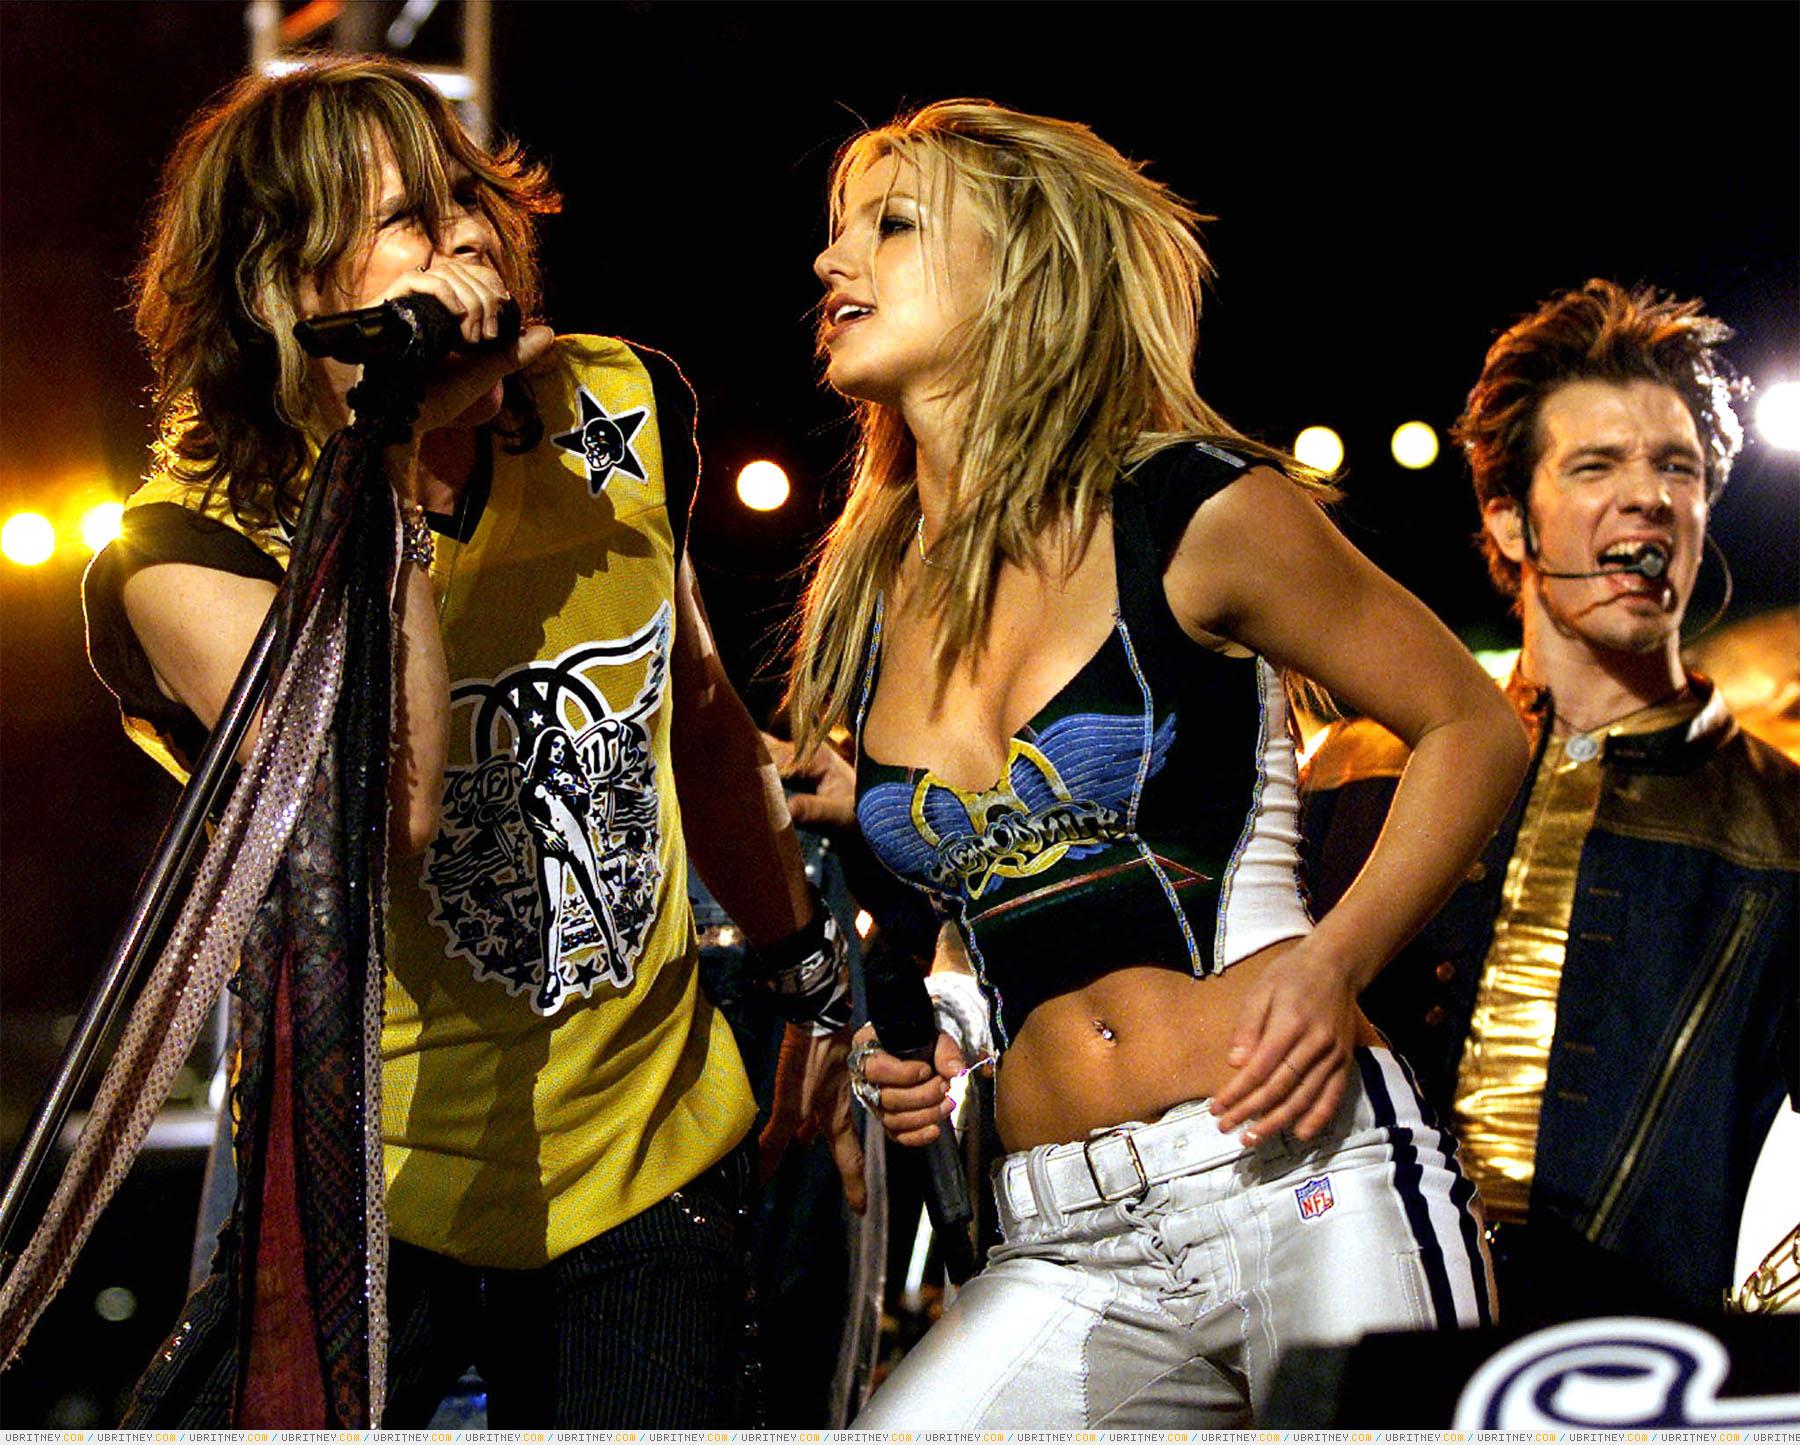 Шоу Super Bowl XXXV Halftime (Бритни Спирс, Britney Spears) .